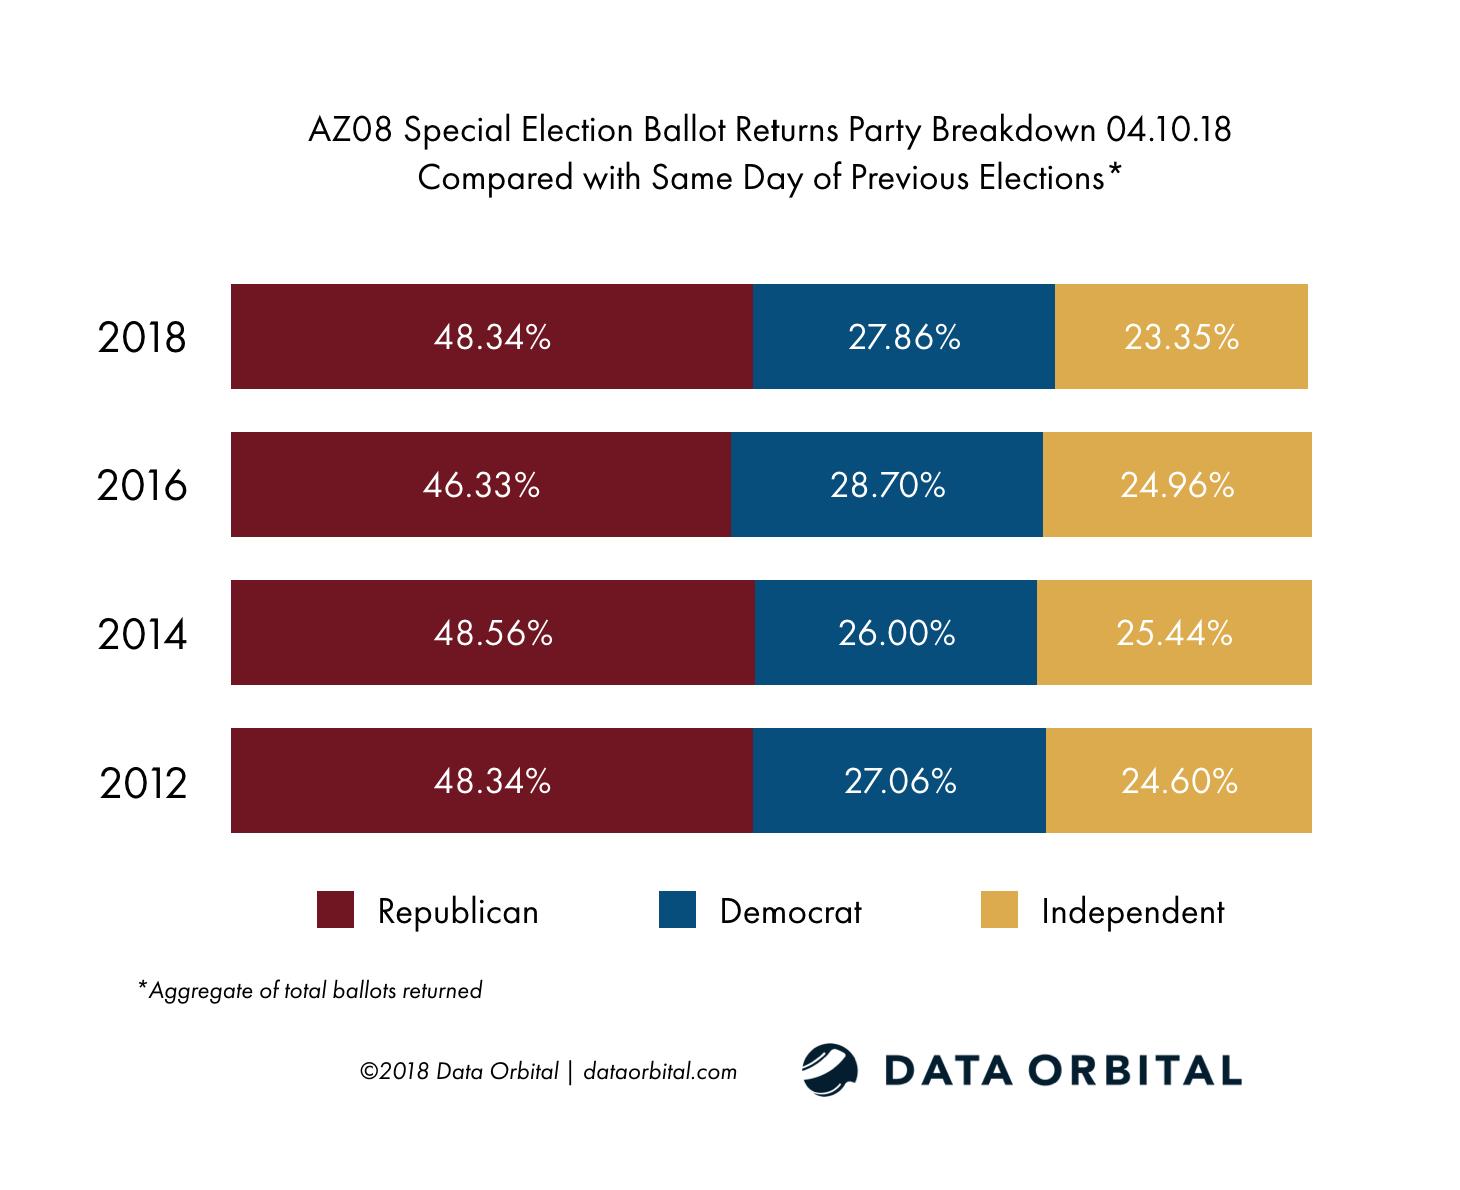 AZ08 Special Election Ballot Returns 04.10.18 Turnout by Party vs. Historical Turnout